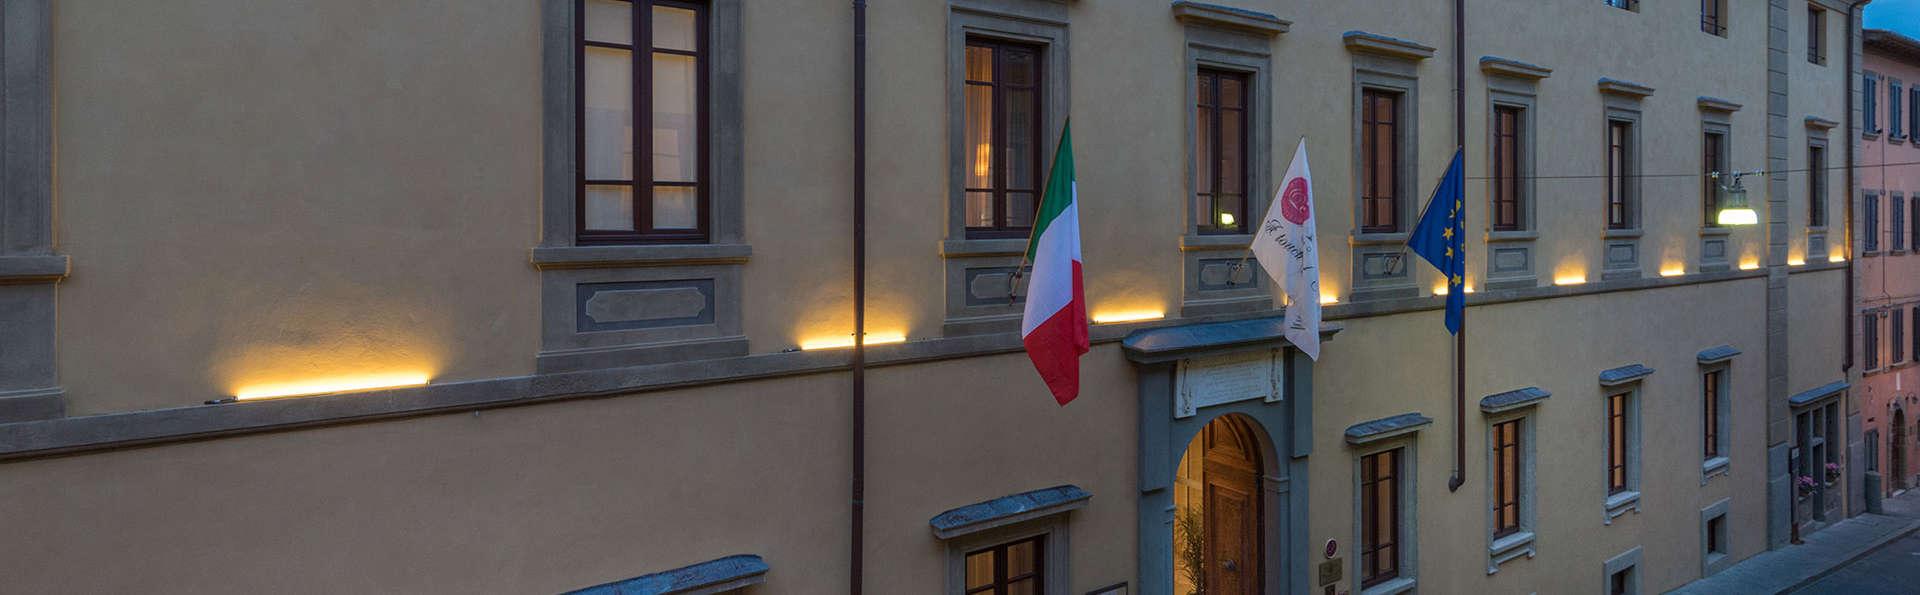 Palazzo San Lorenzo  - edit_front.jpg